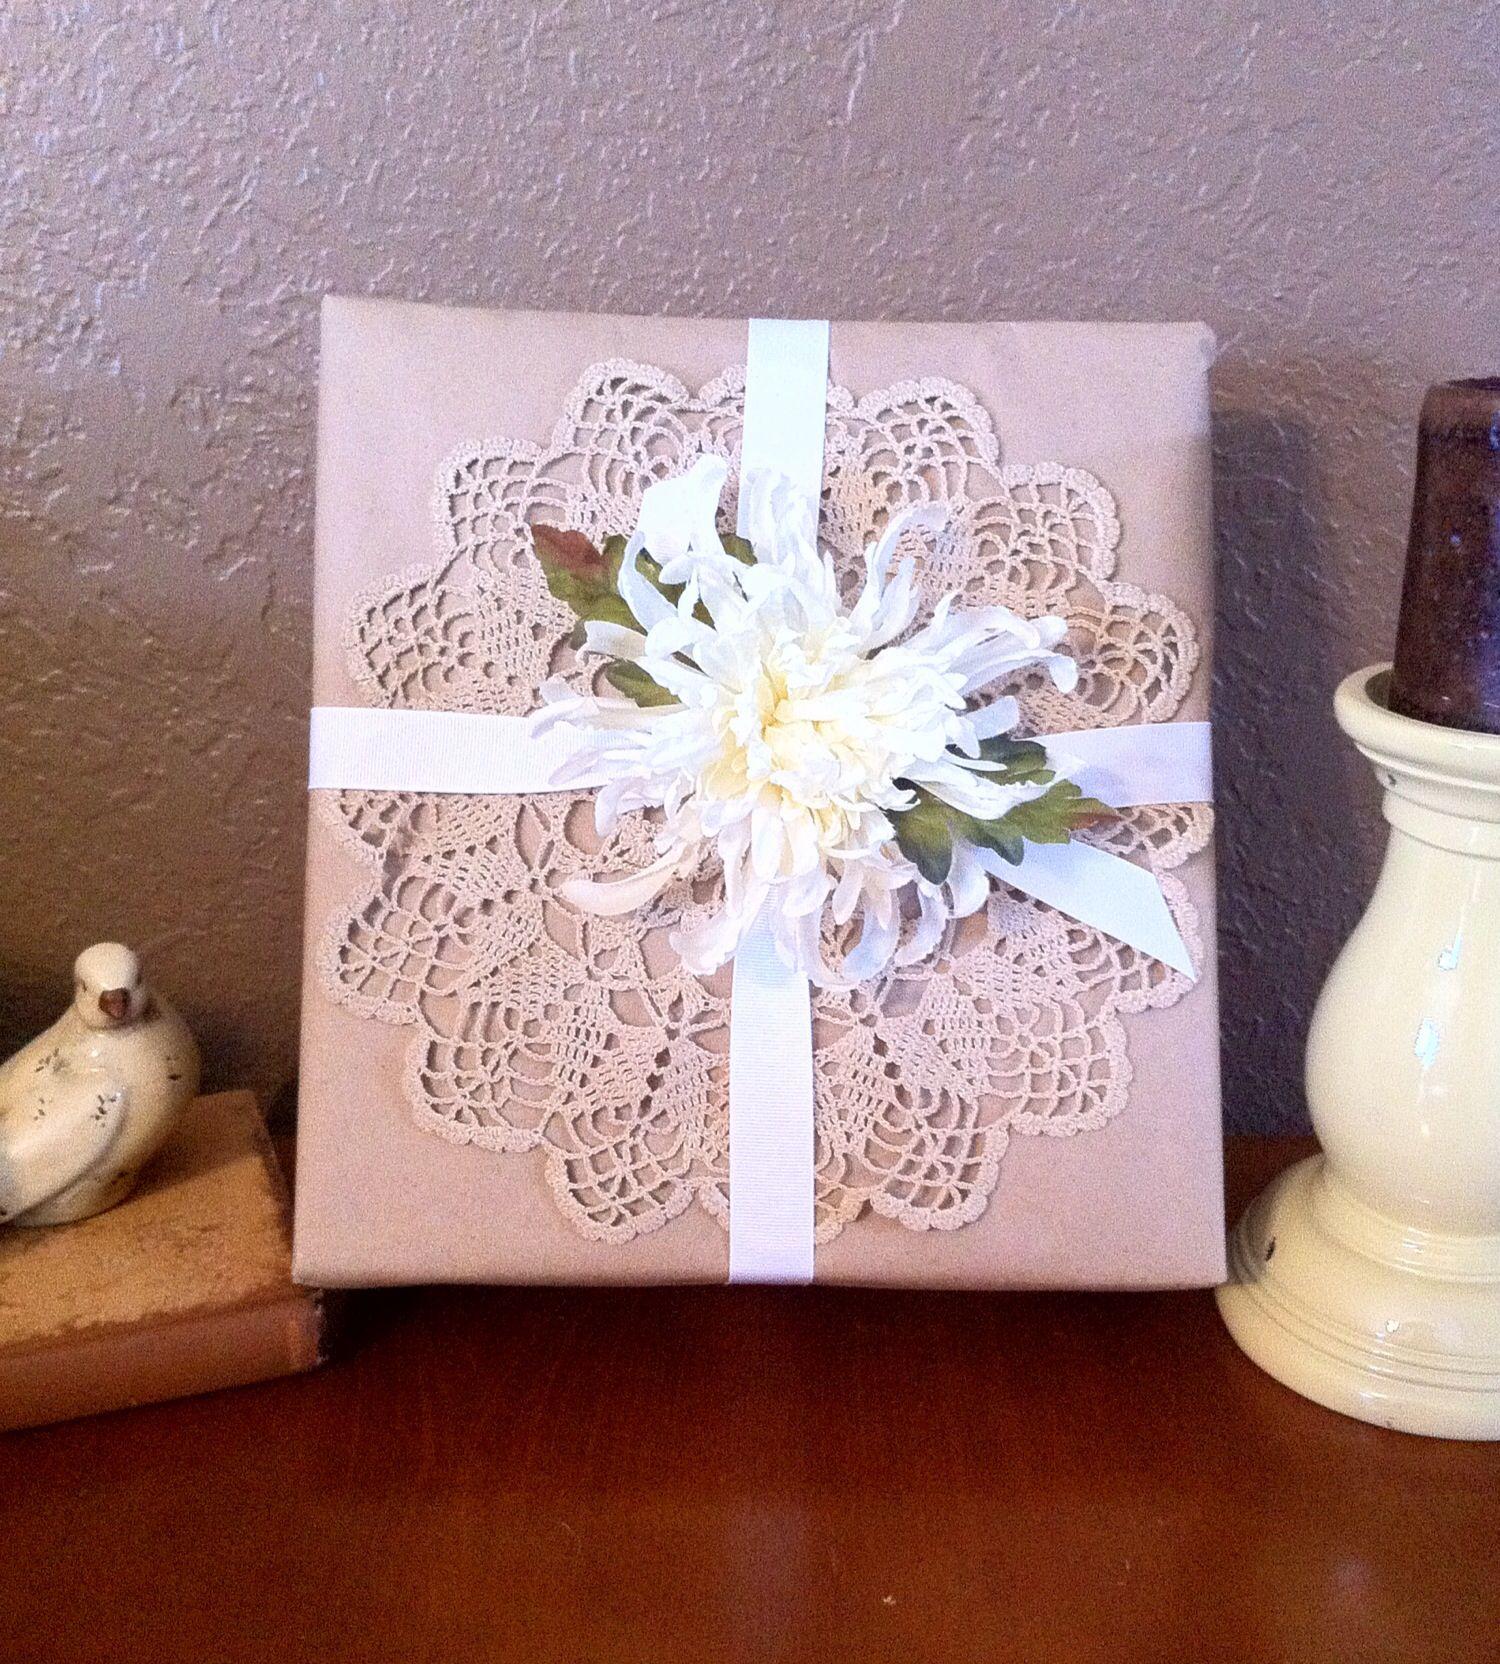 Bridal Shower Gift Wrap. Craft Paper, Vintage Doily, White